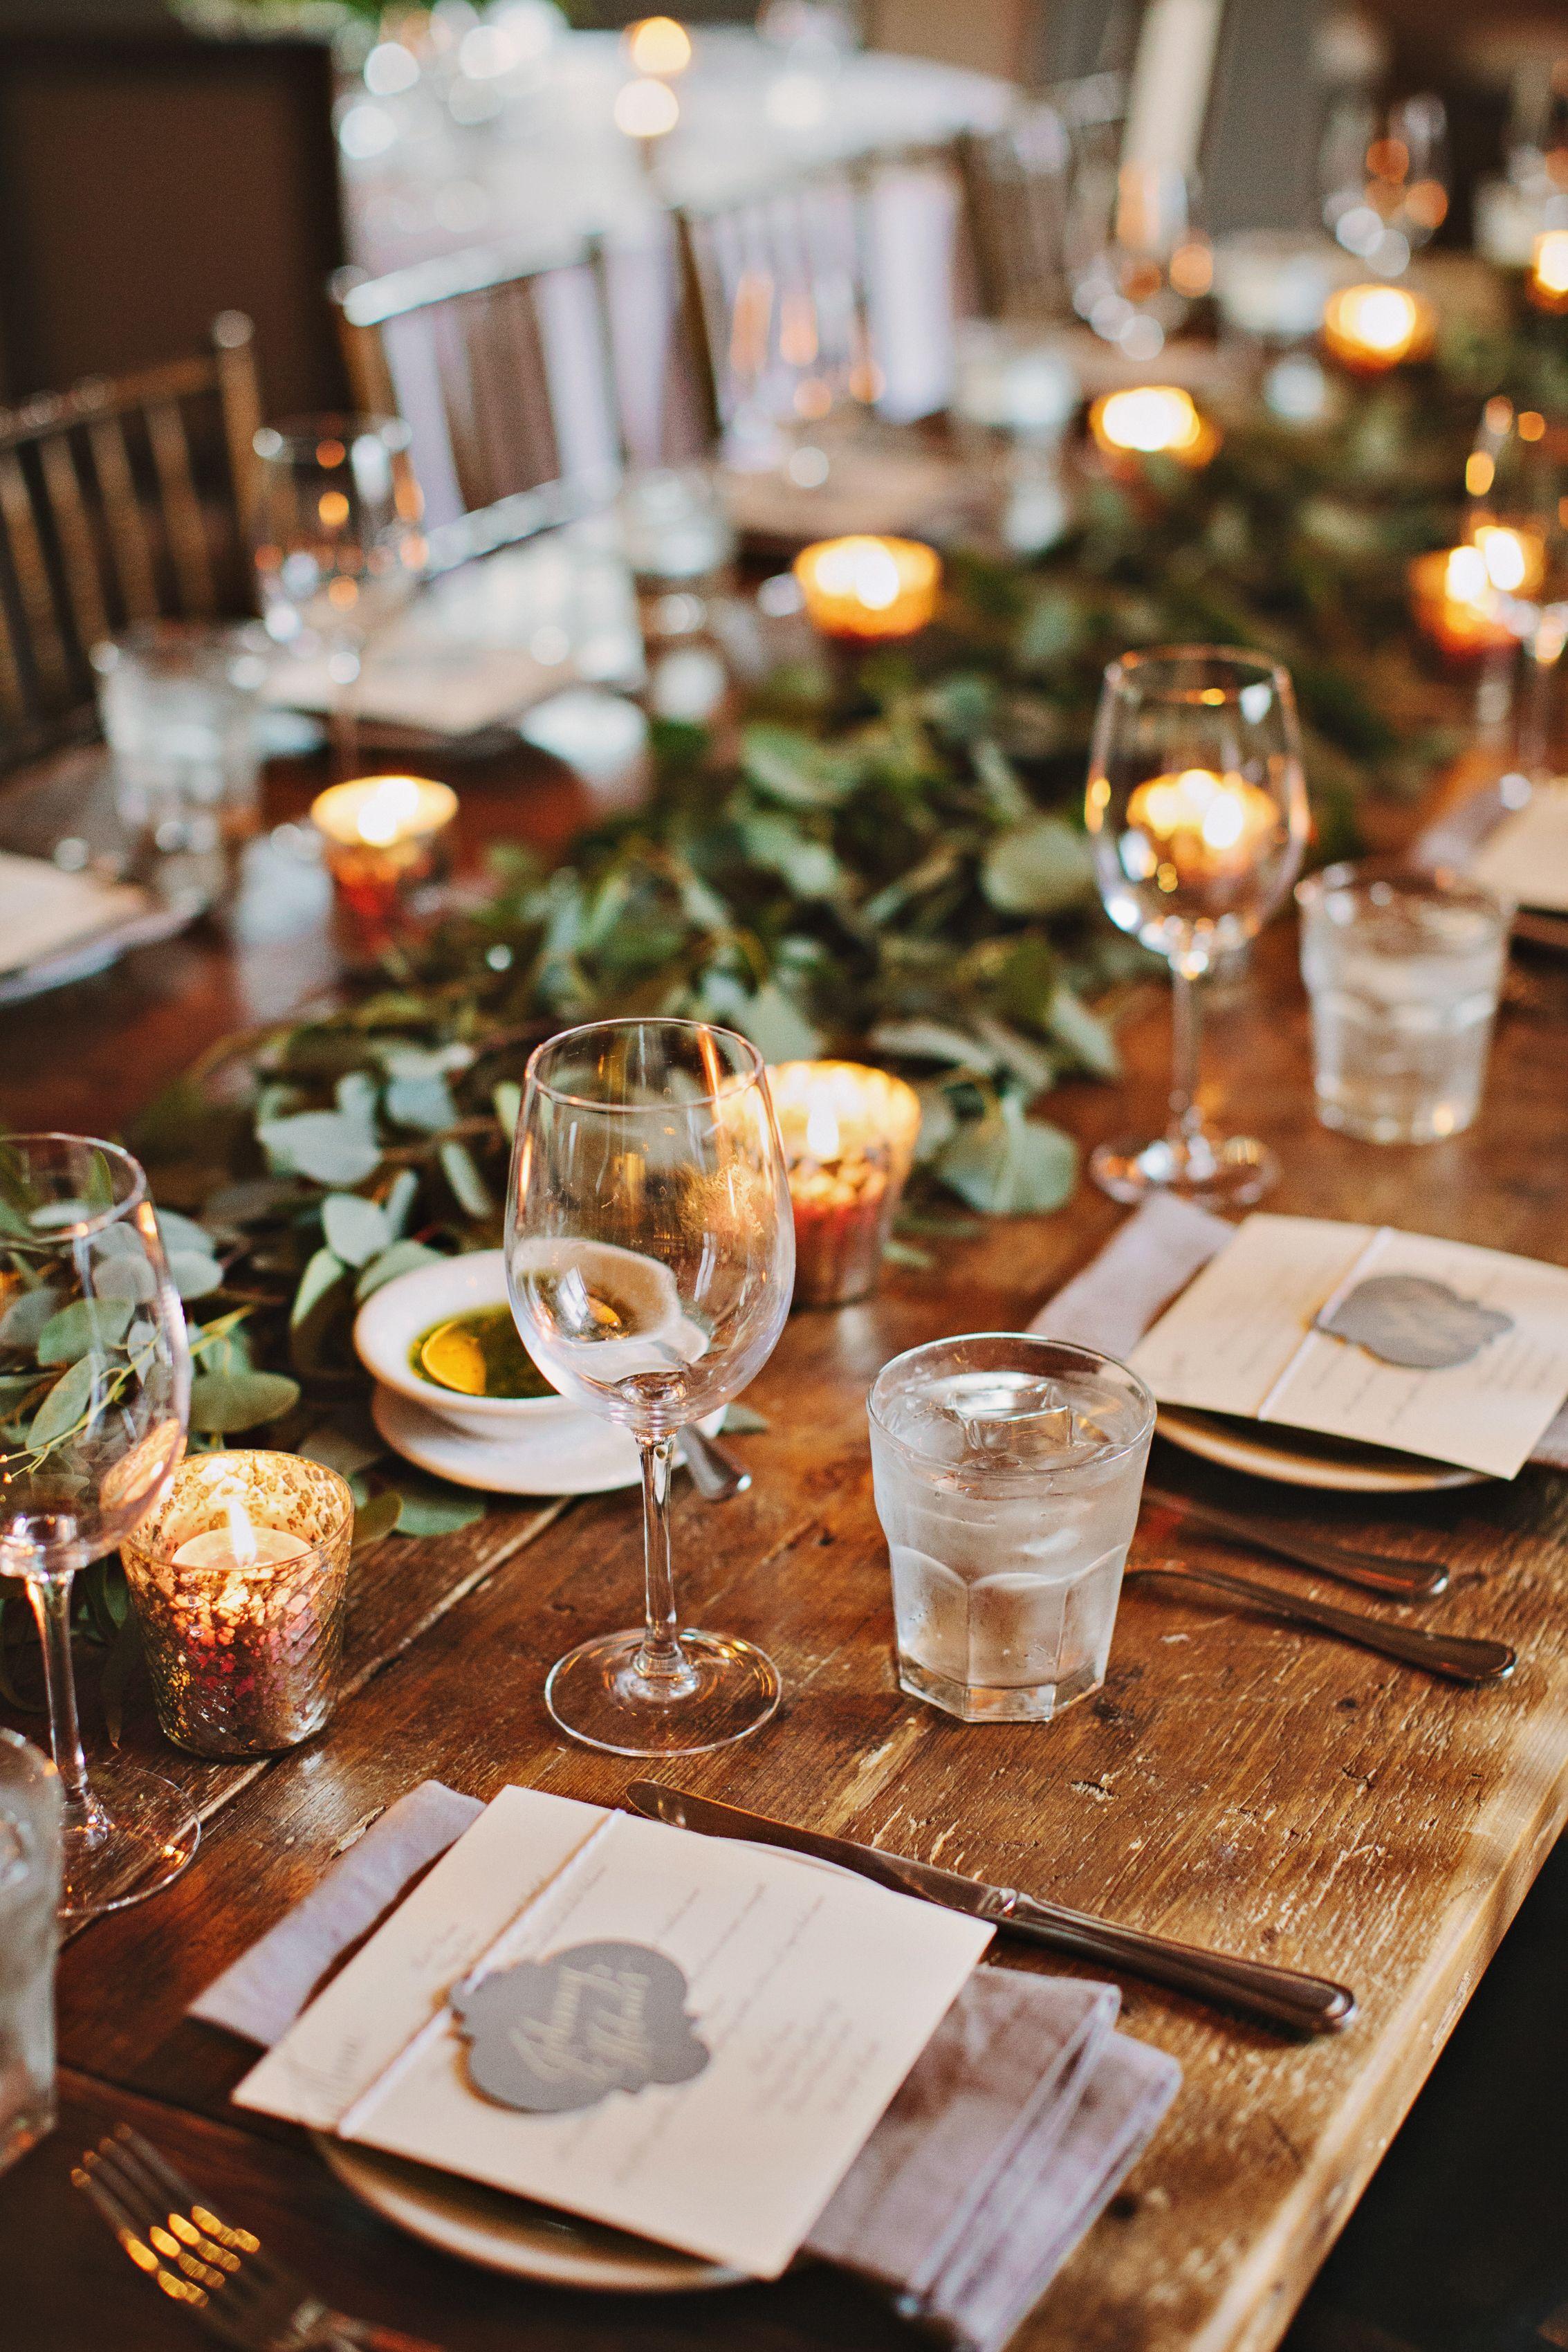 Wedding Location The Villa Woodland Hills Ca Center Greenery Poppyhill Flowers Photography Wisteria Design Studio